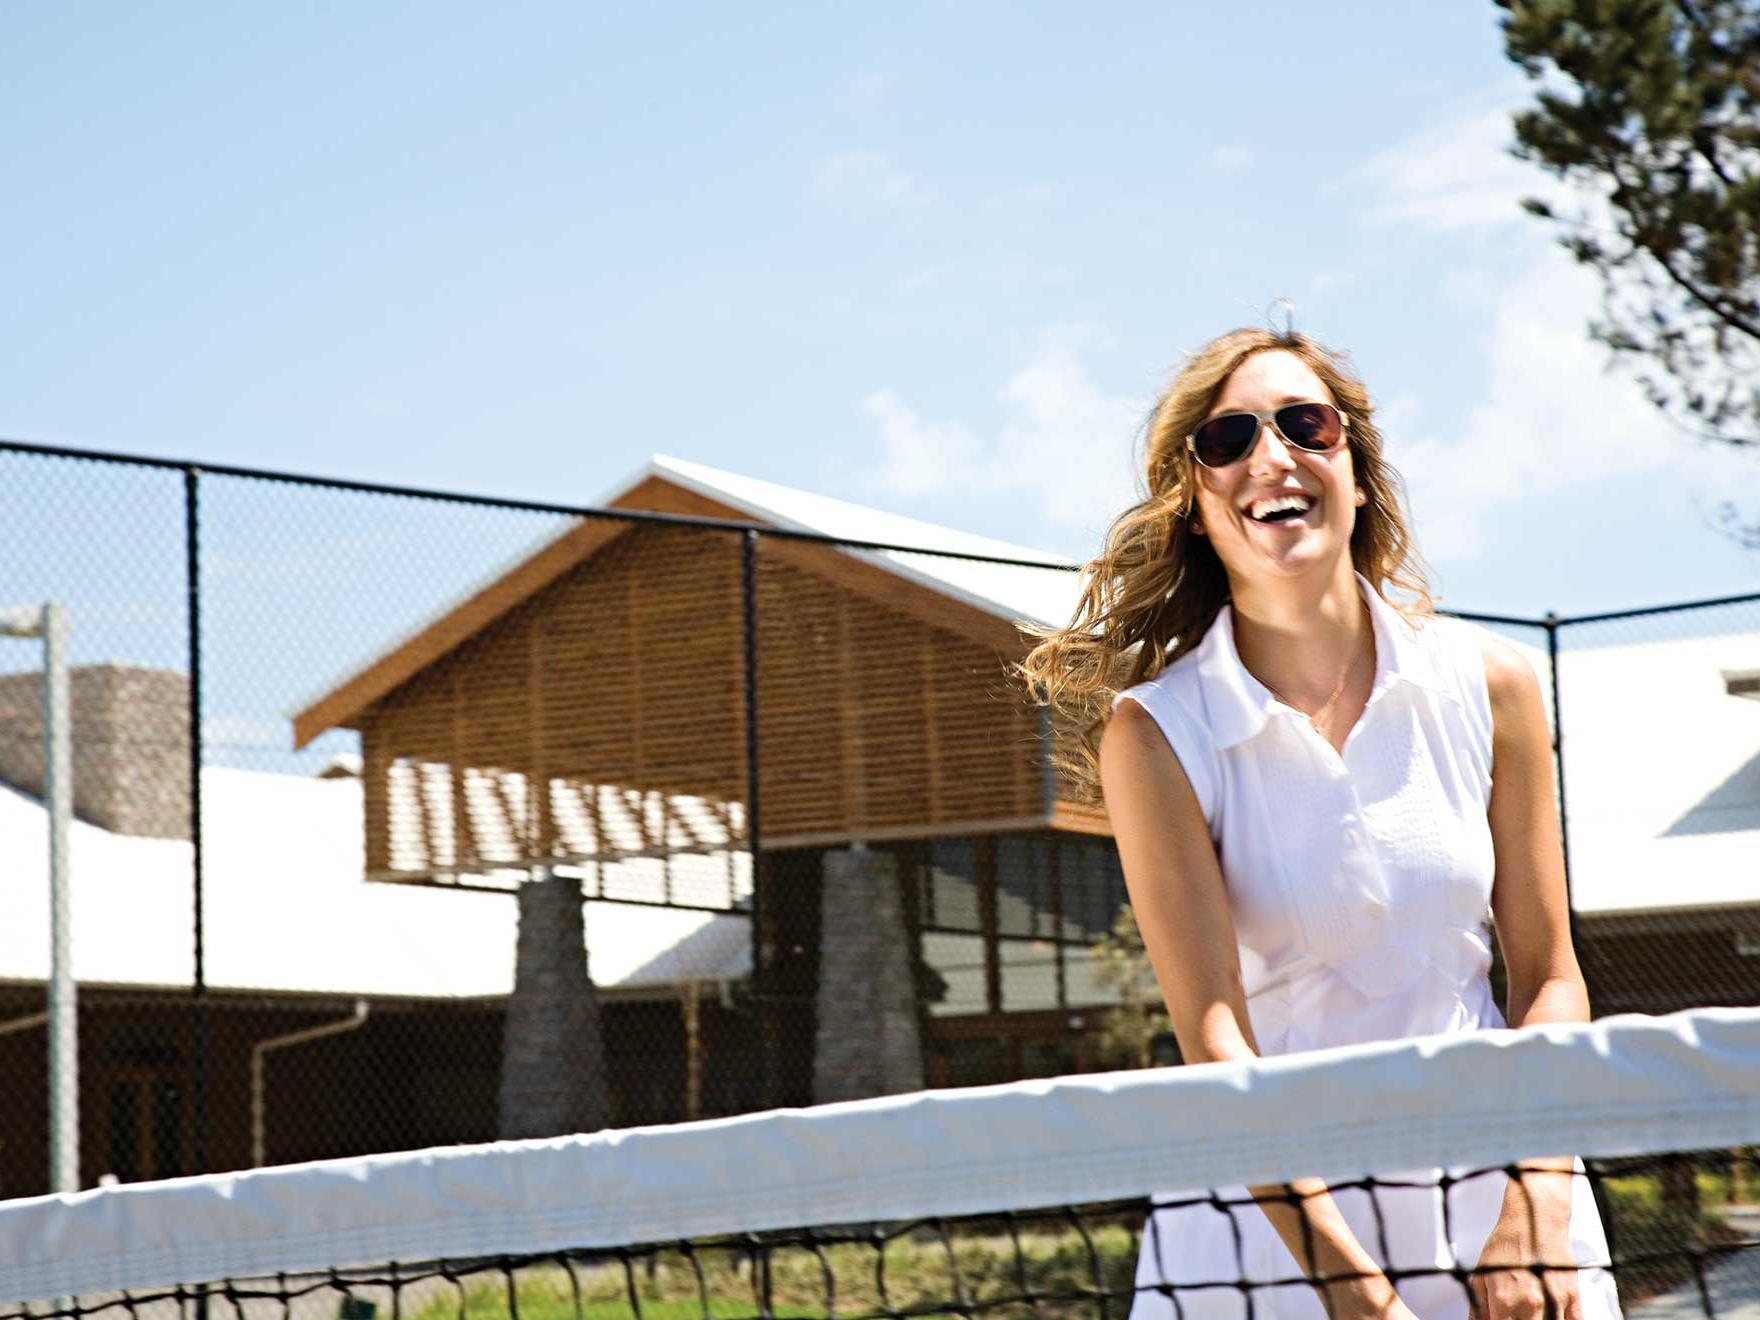 Woman near tennis net in Lit tennis court at Silverwater Resort